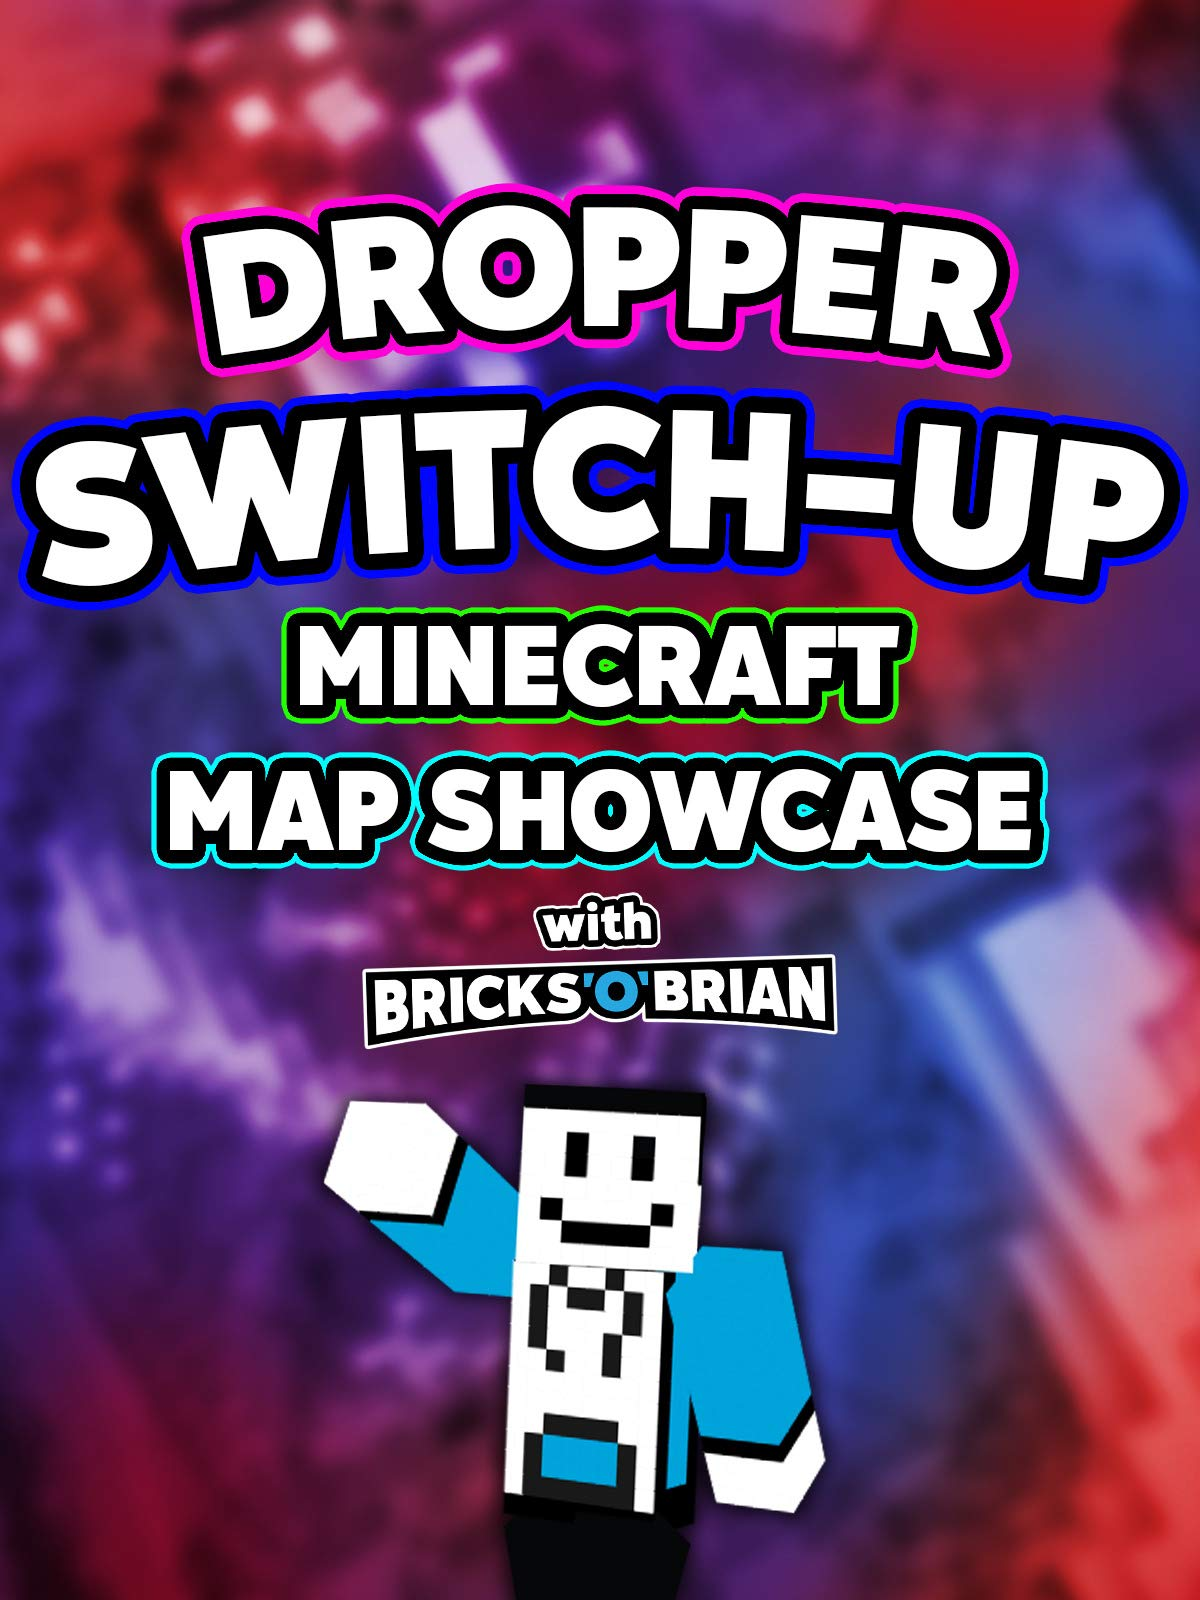 Clip: Dropper Switch-Up Minecraft Map Showcase with Bricks 'O' Brian!